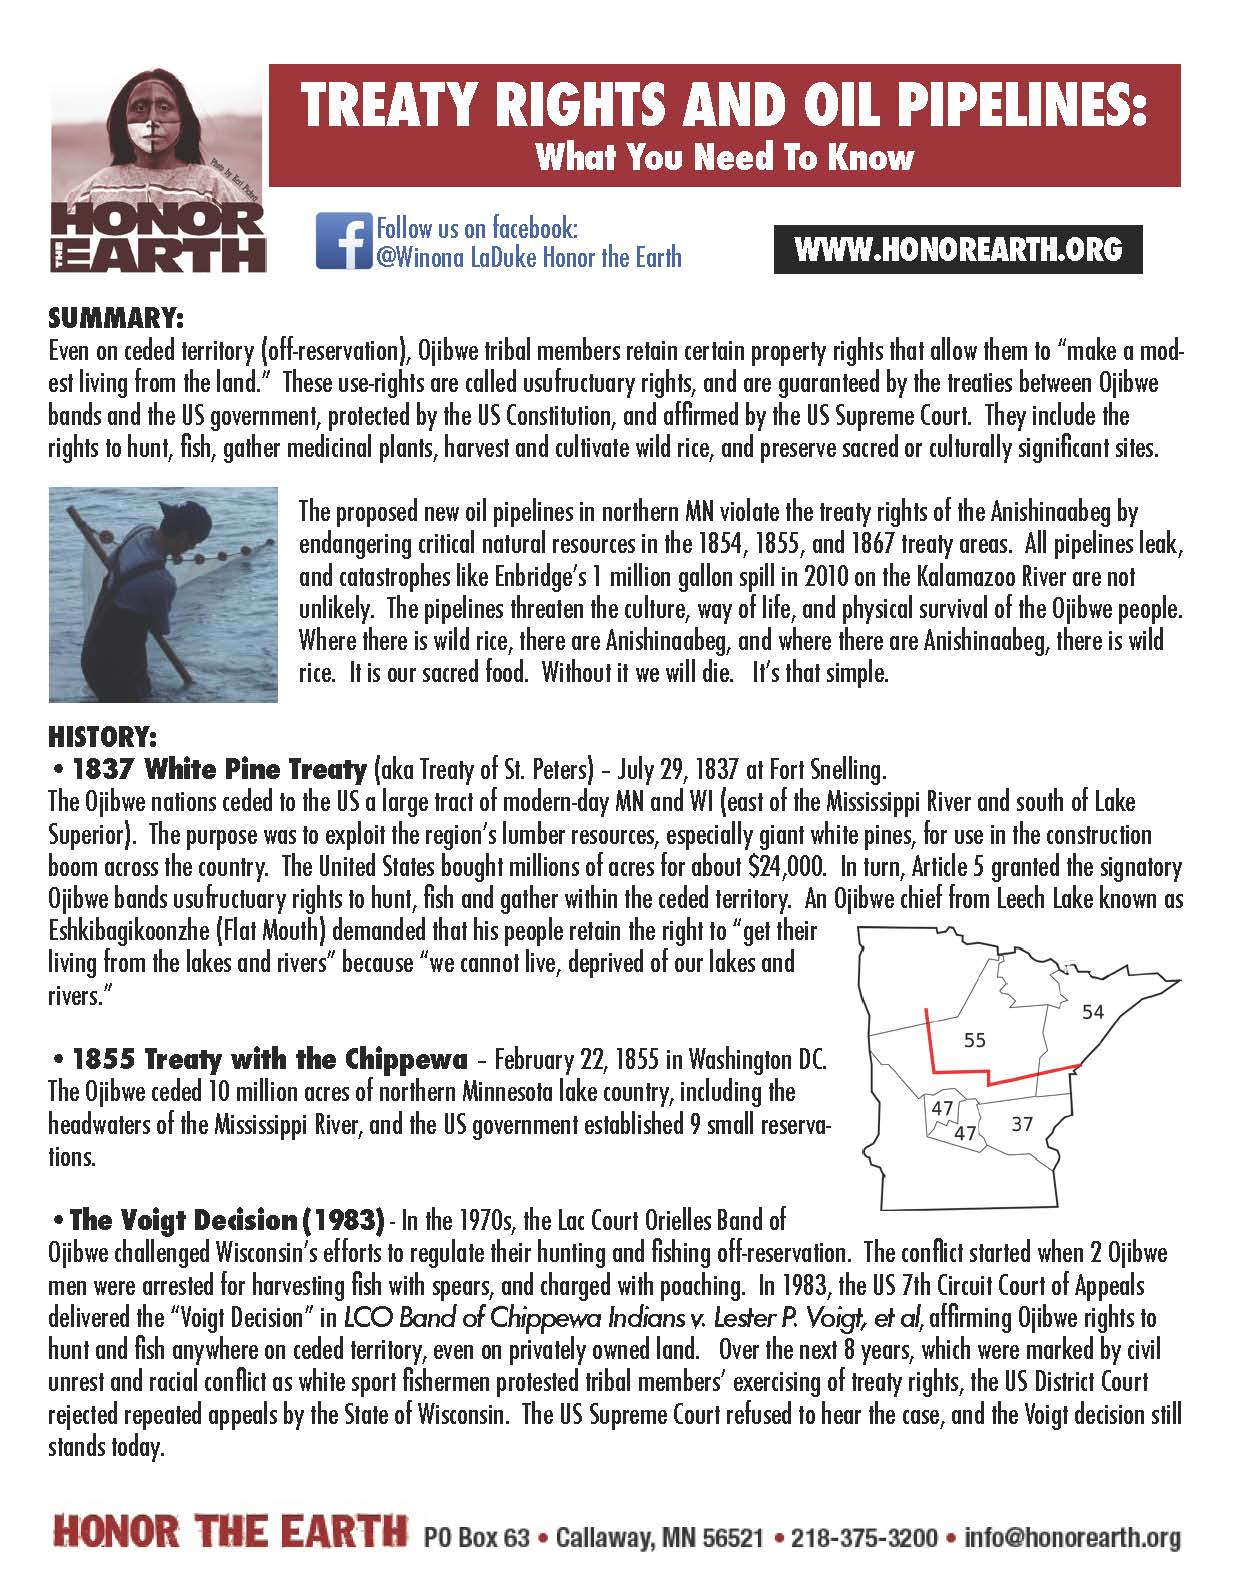 factsheet_TREATY_RIGHTS_(1)_Page_1.jpg